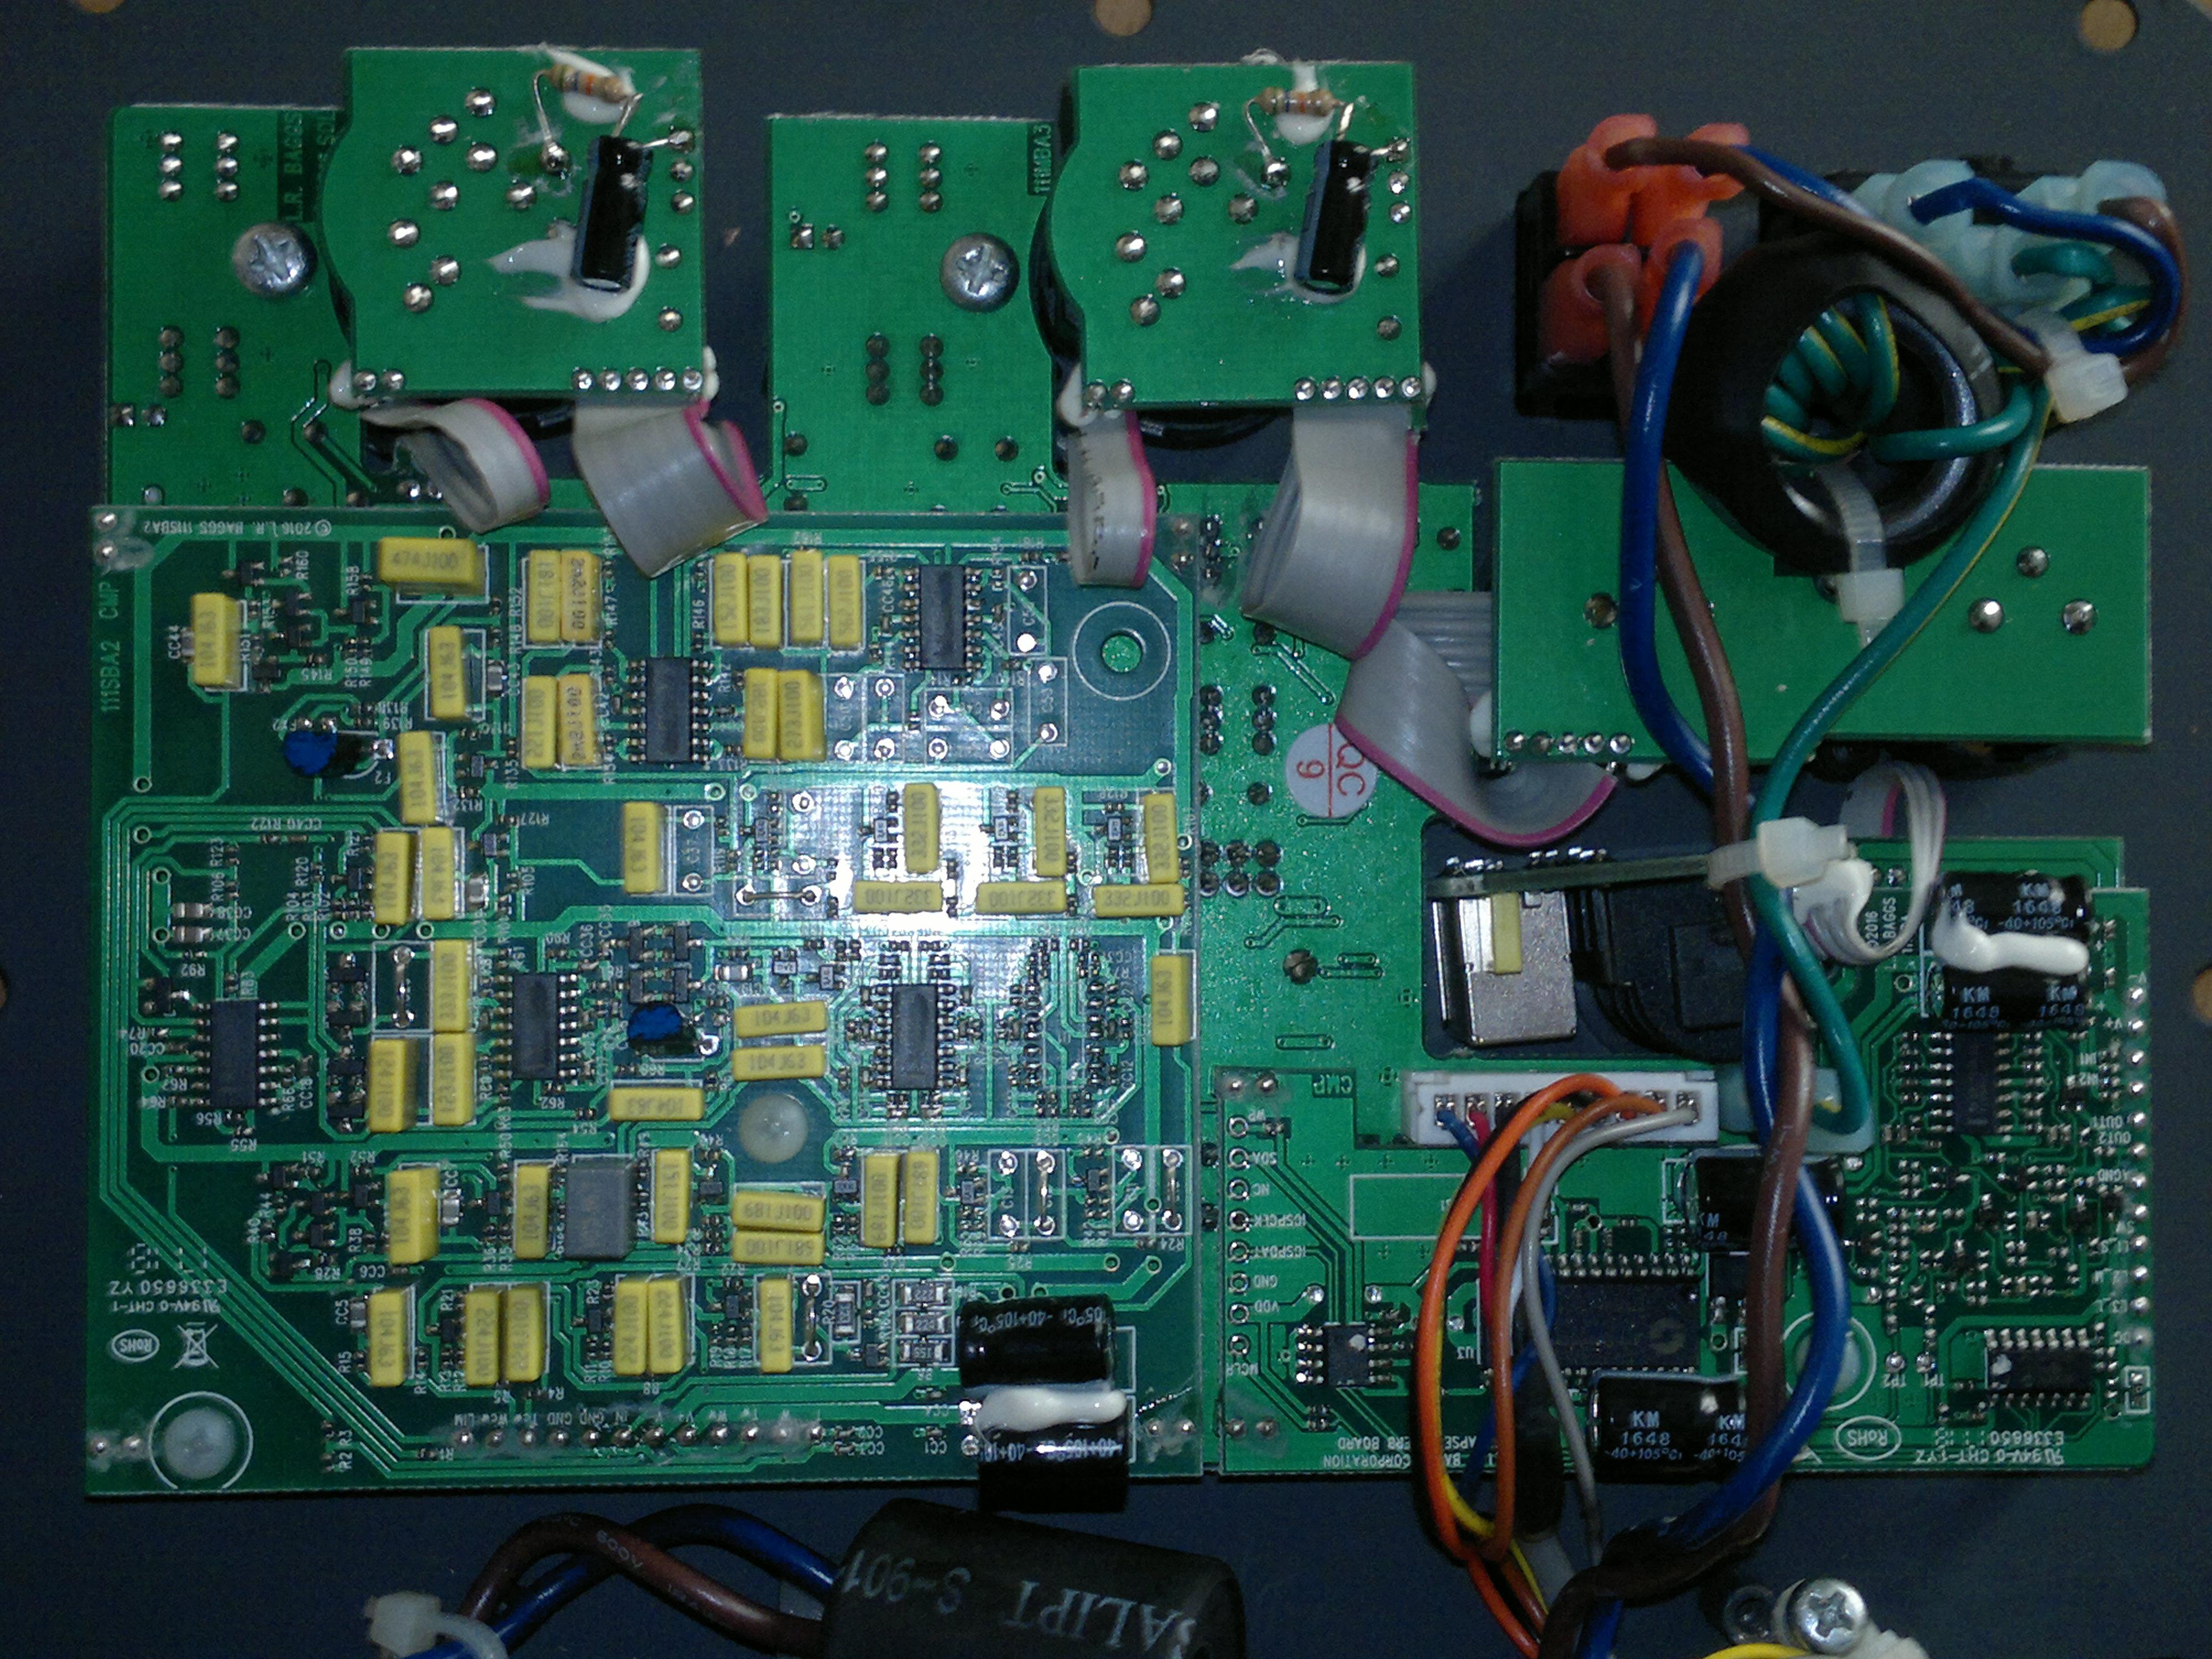 Tecnici elettronici e liutai bravi ed onesti